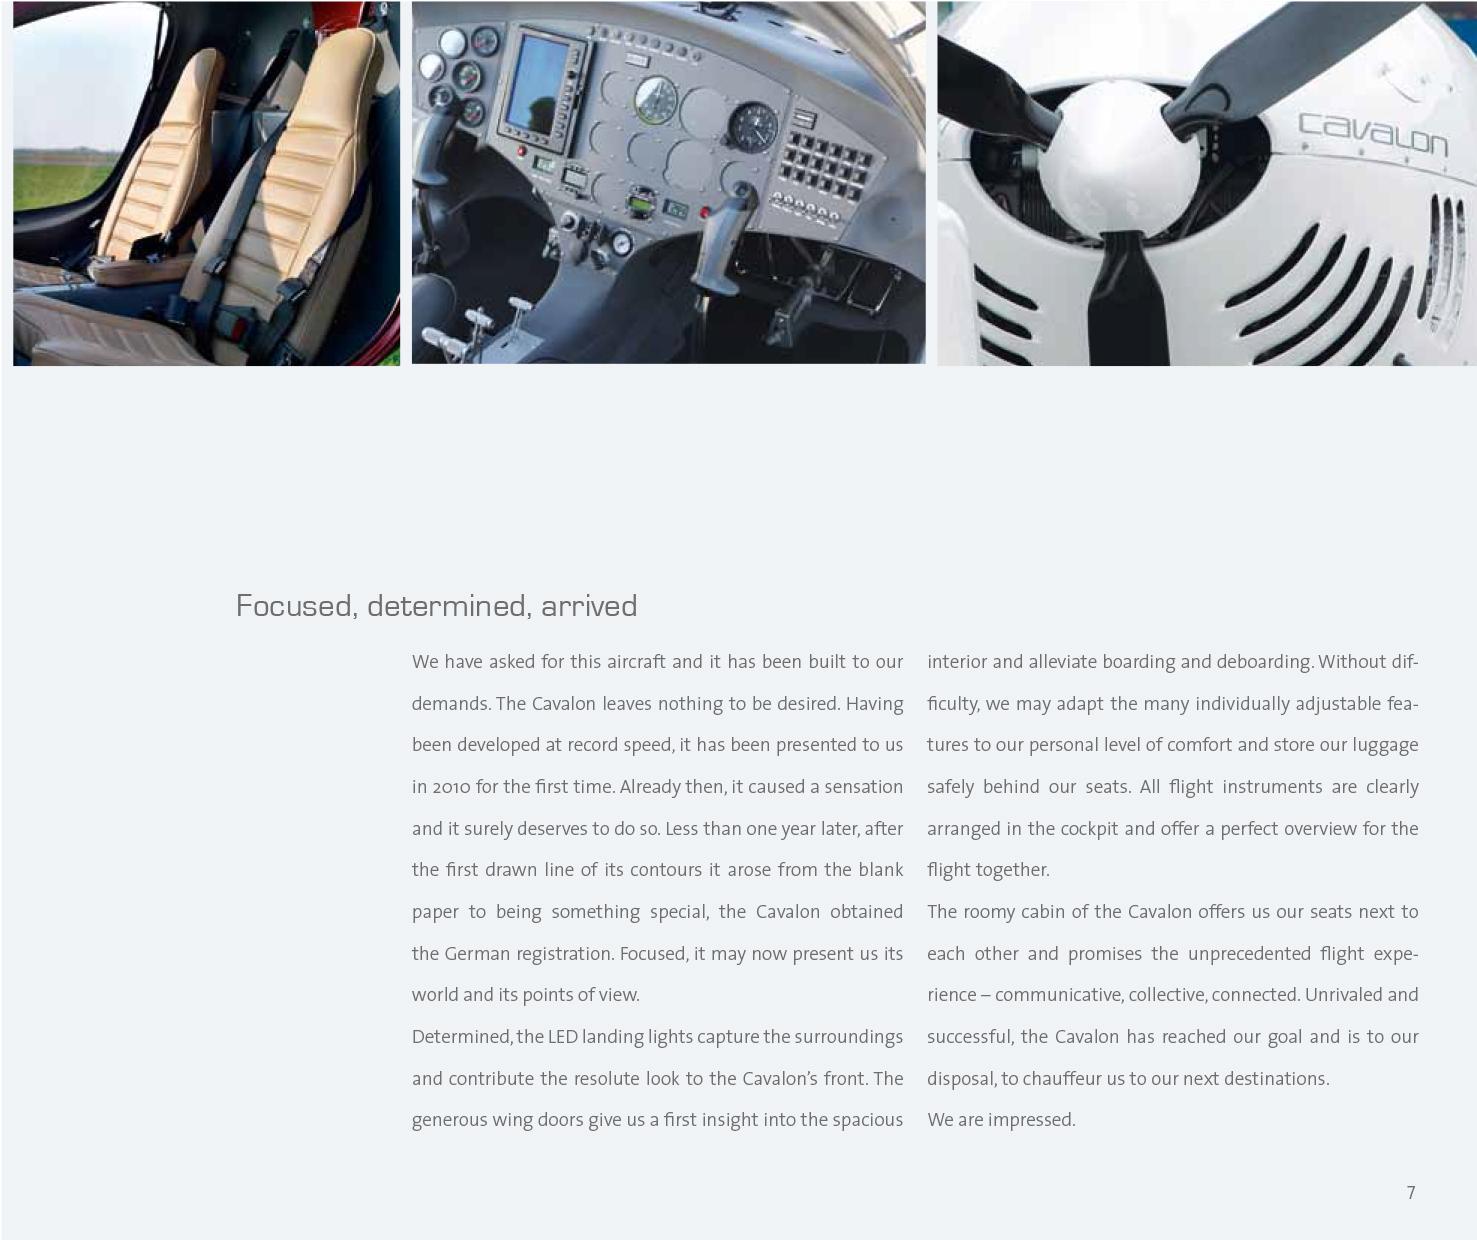 Cavalon_Brochure_2013-7.jpg